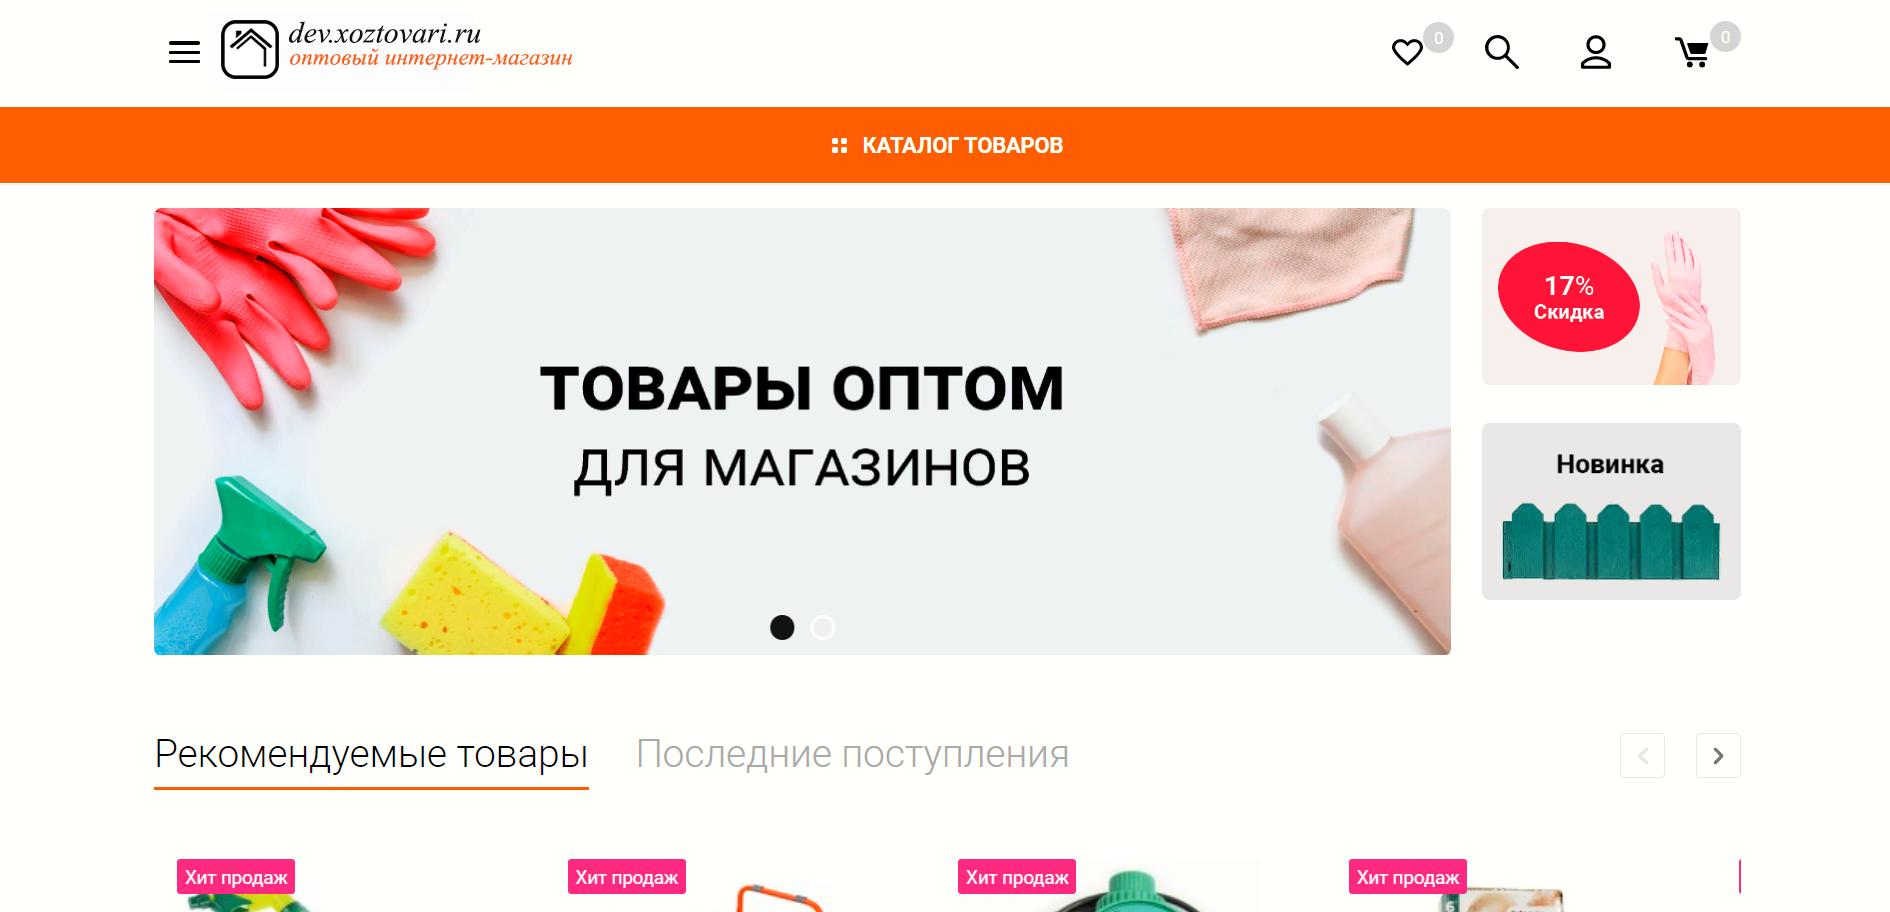 Разработка логотипа для оптового интернет-магазина «Хозтовары.ру» фото f_258606c9e72c419f.png